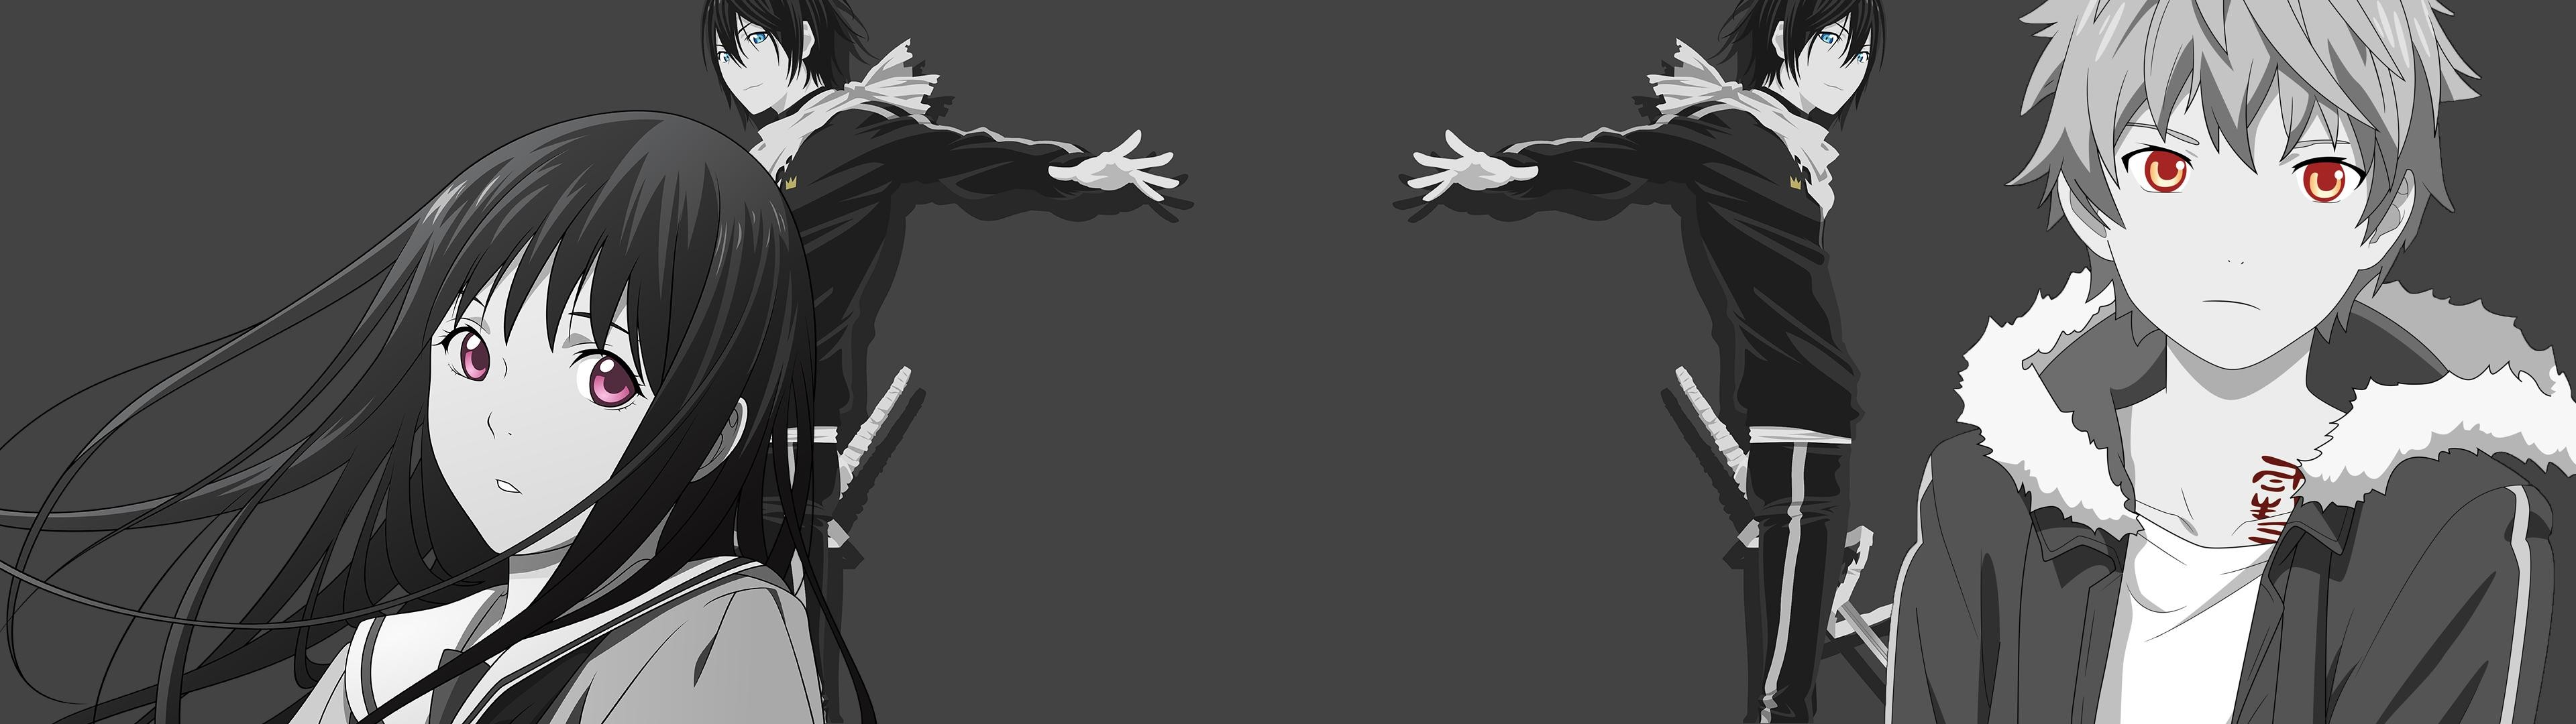 Fan MadeNoragami Dual Screen Wallpaper …